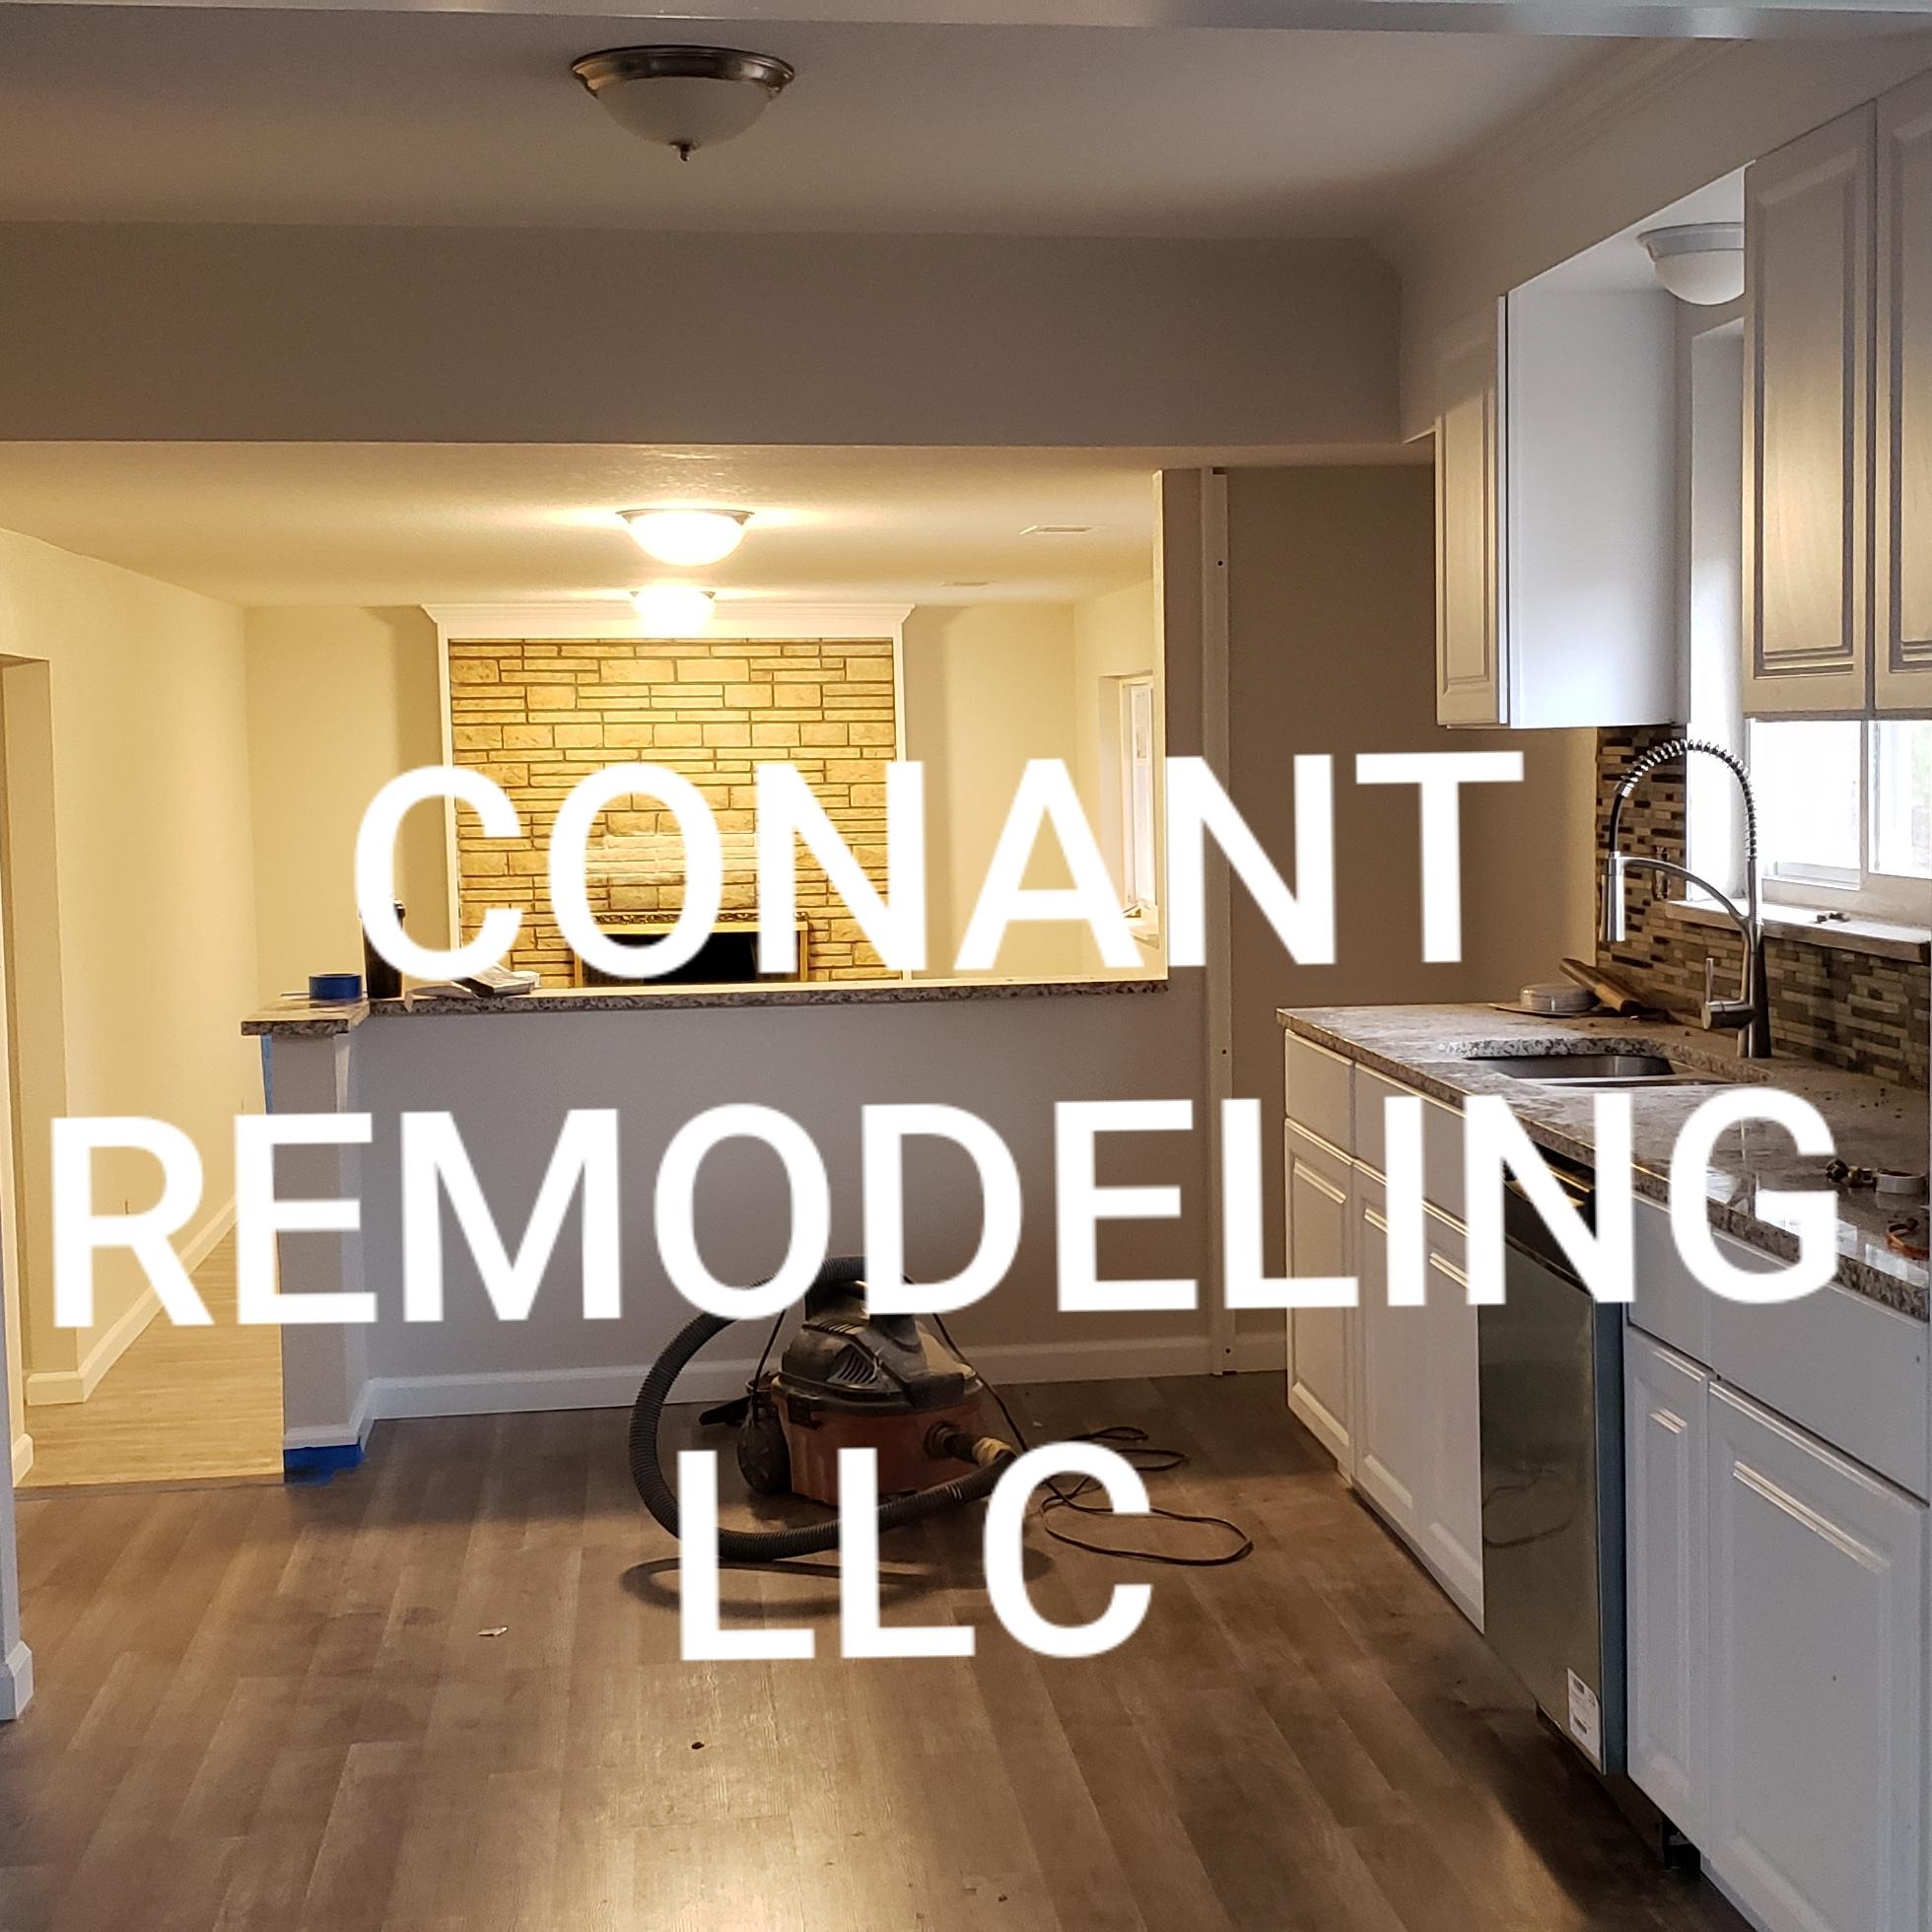 Conant Remodeling LLC